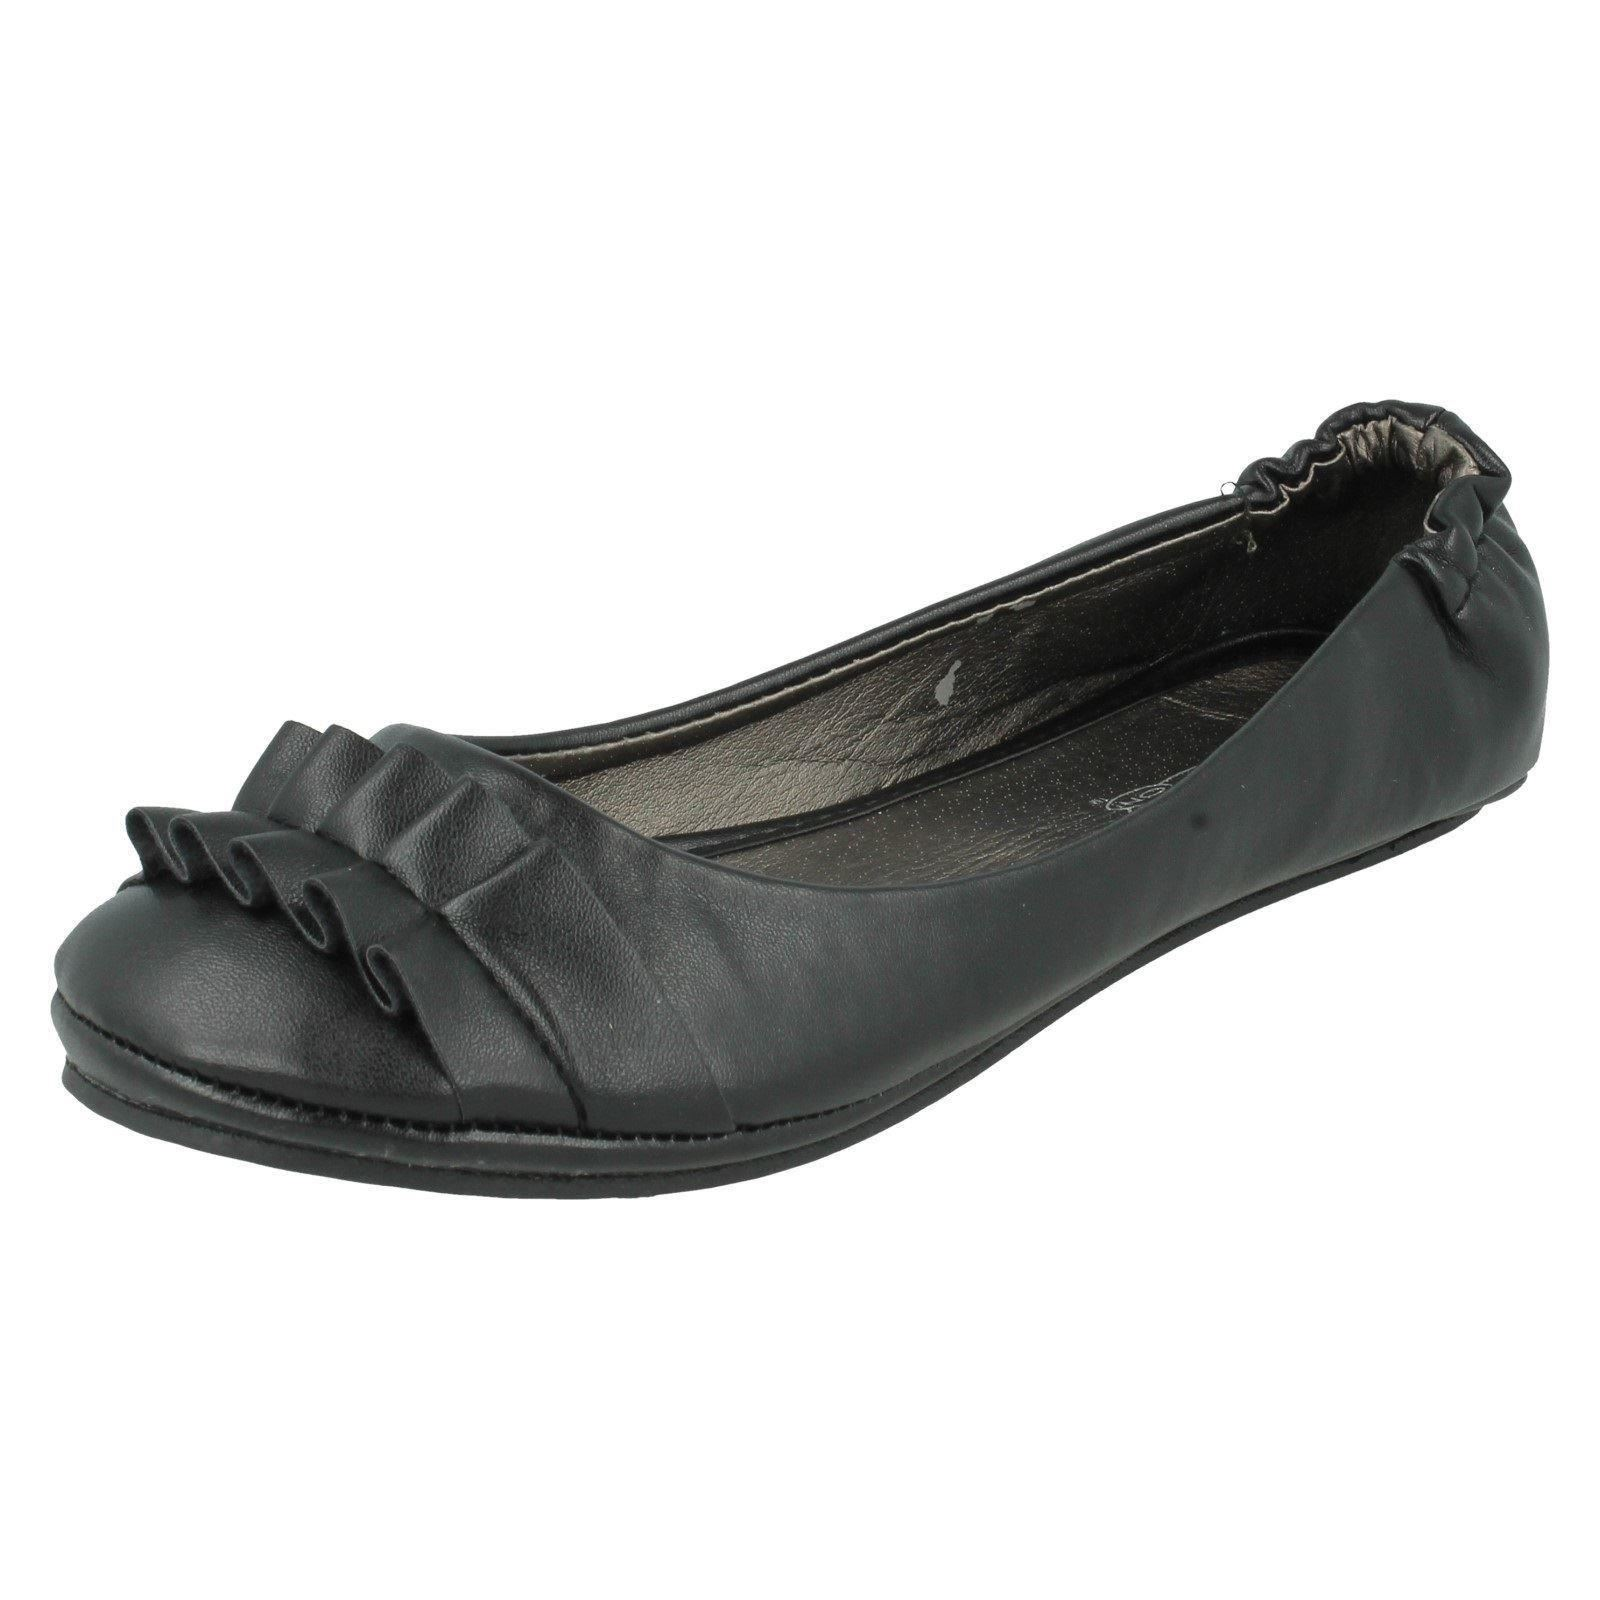 Damas Spot On Puntera Redonda Zapatos Planos Bailarina F8539